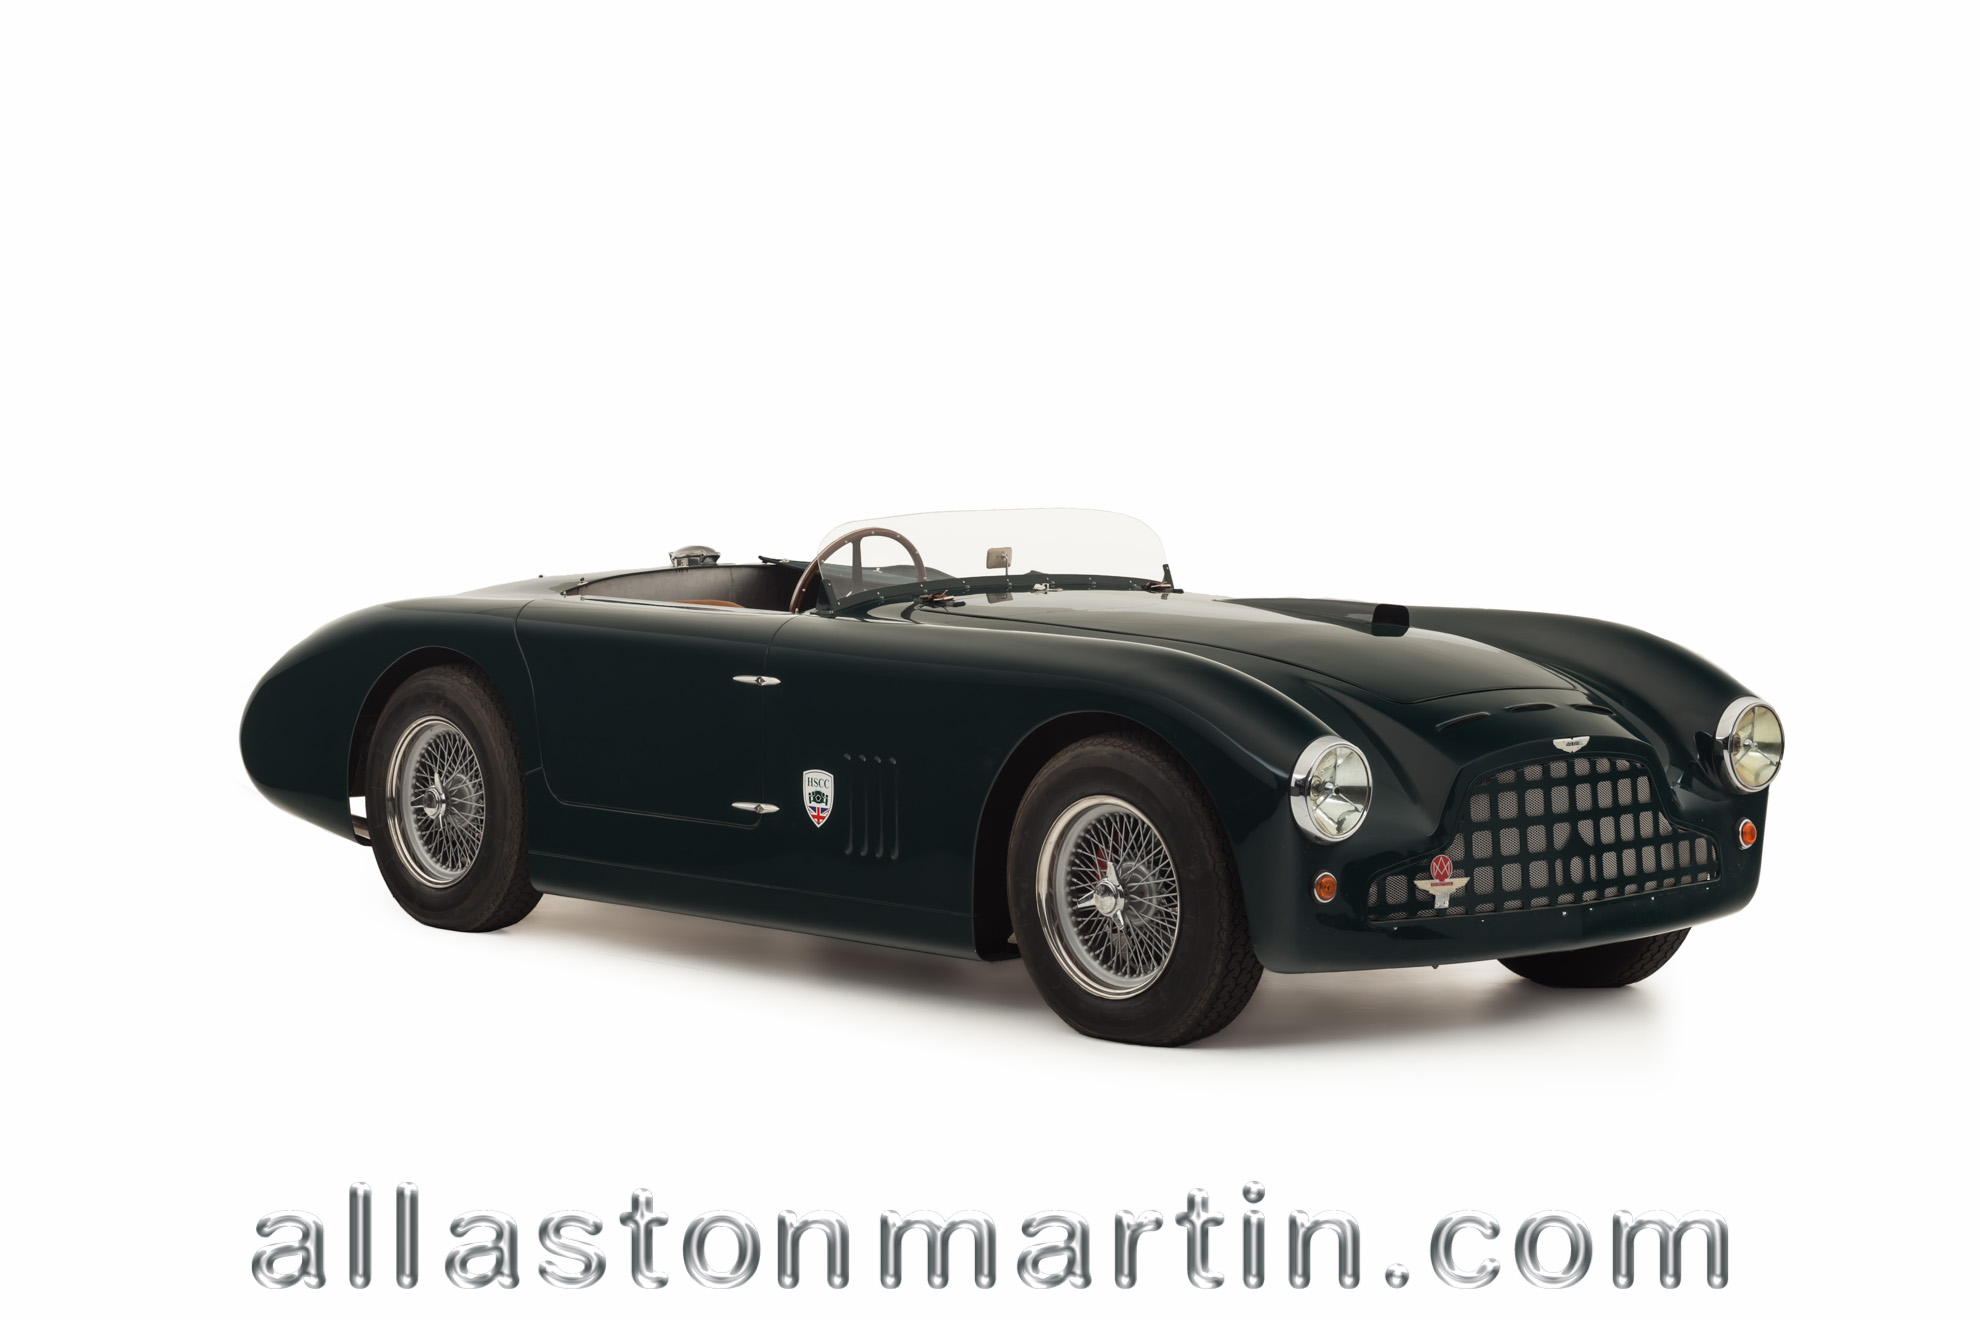 Aston Martin Cars For Sale Buy Aston Martin Details All Aston